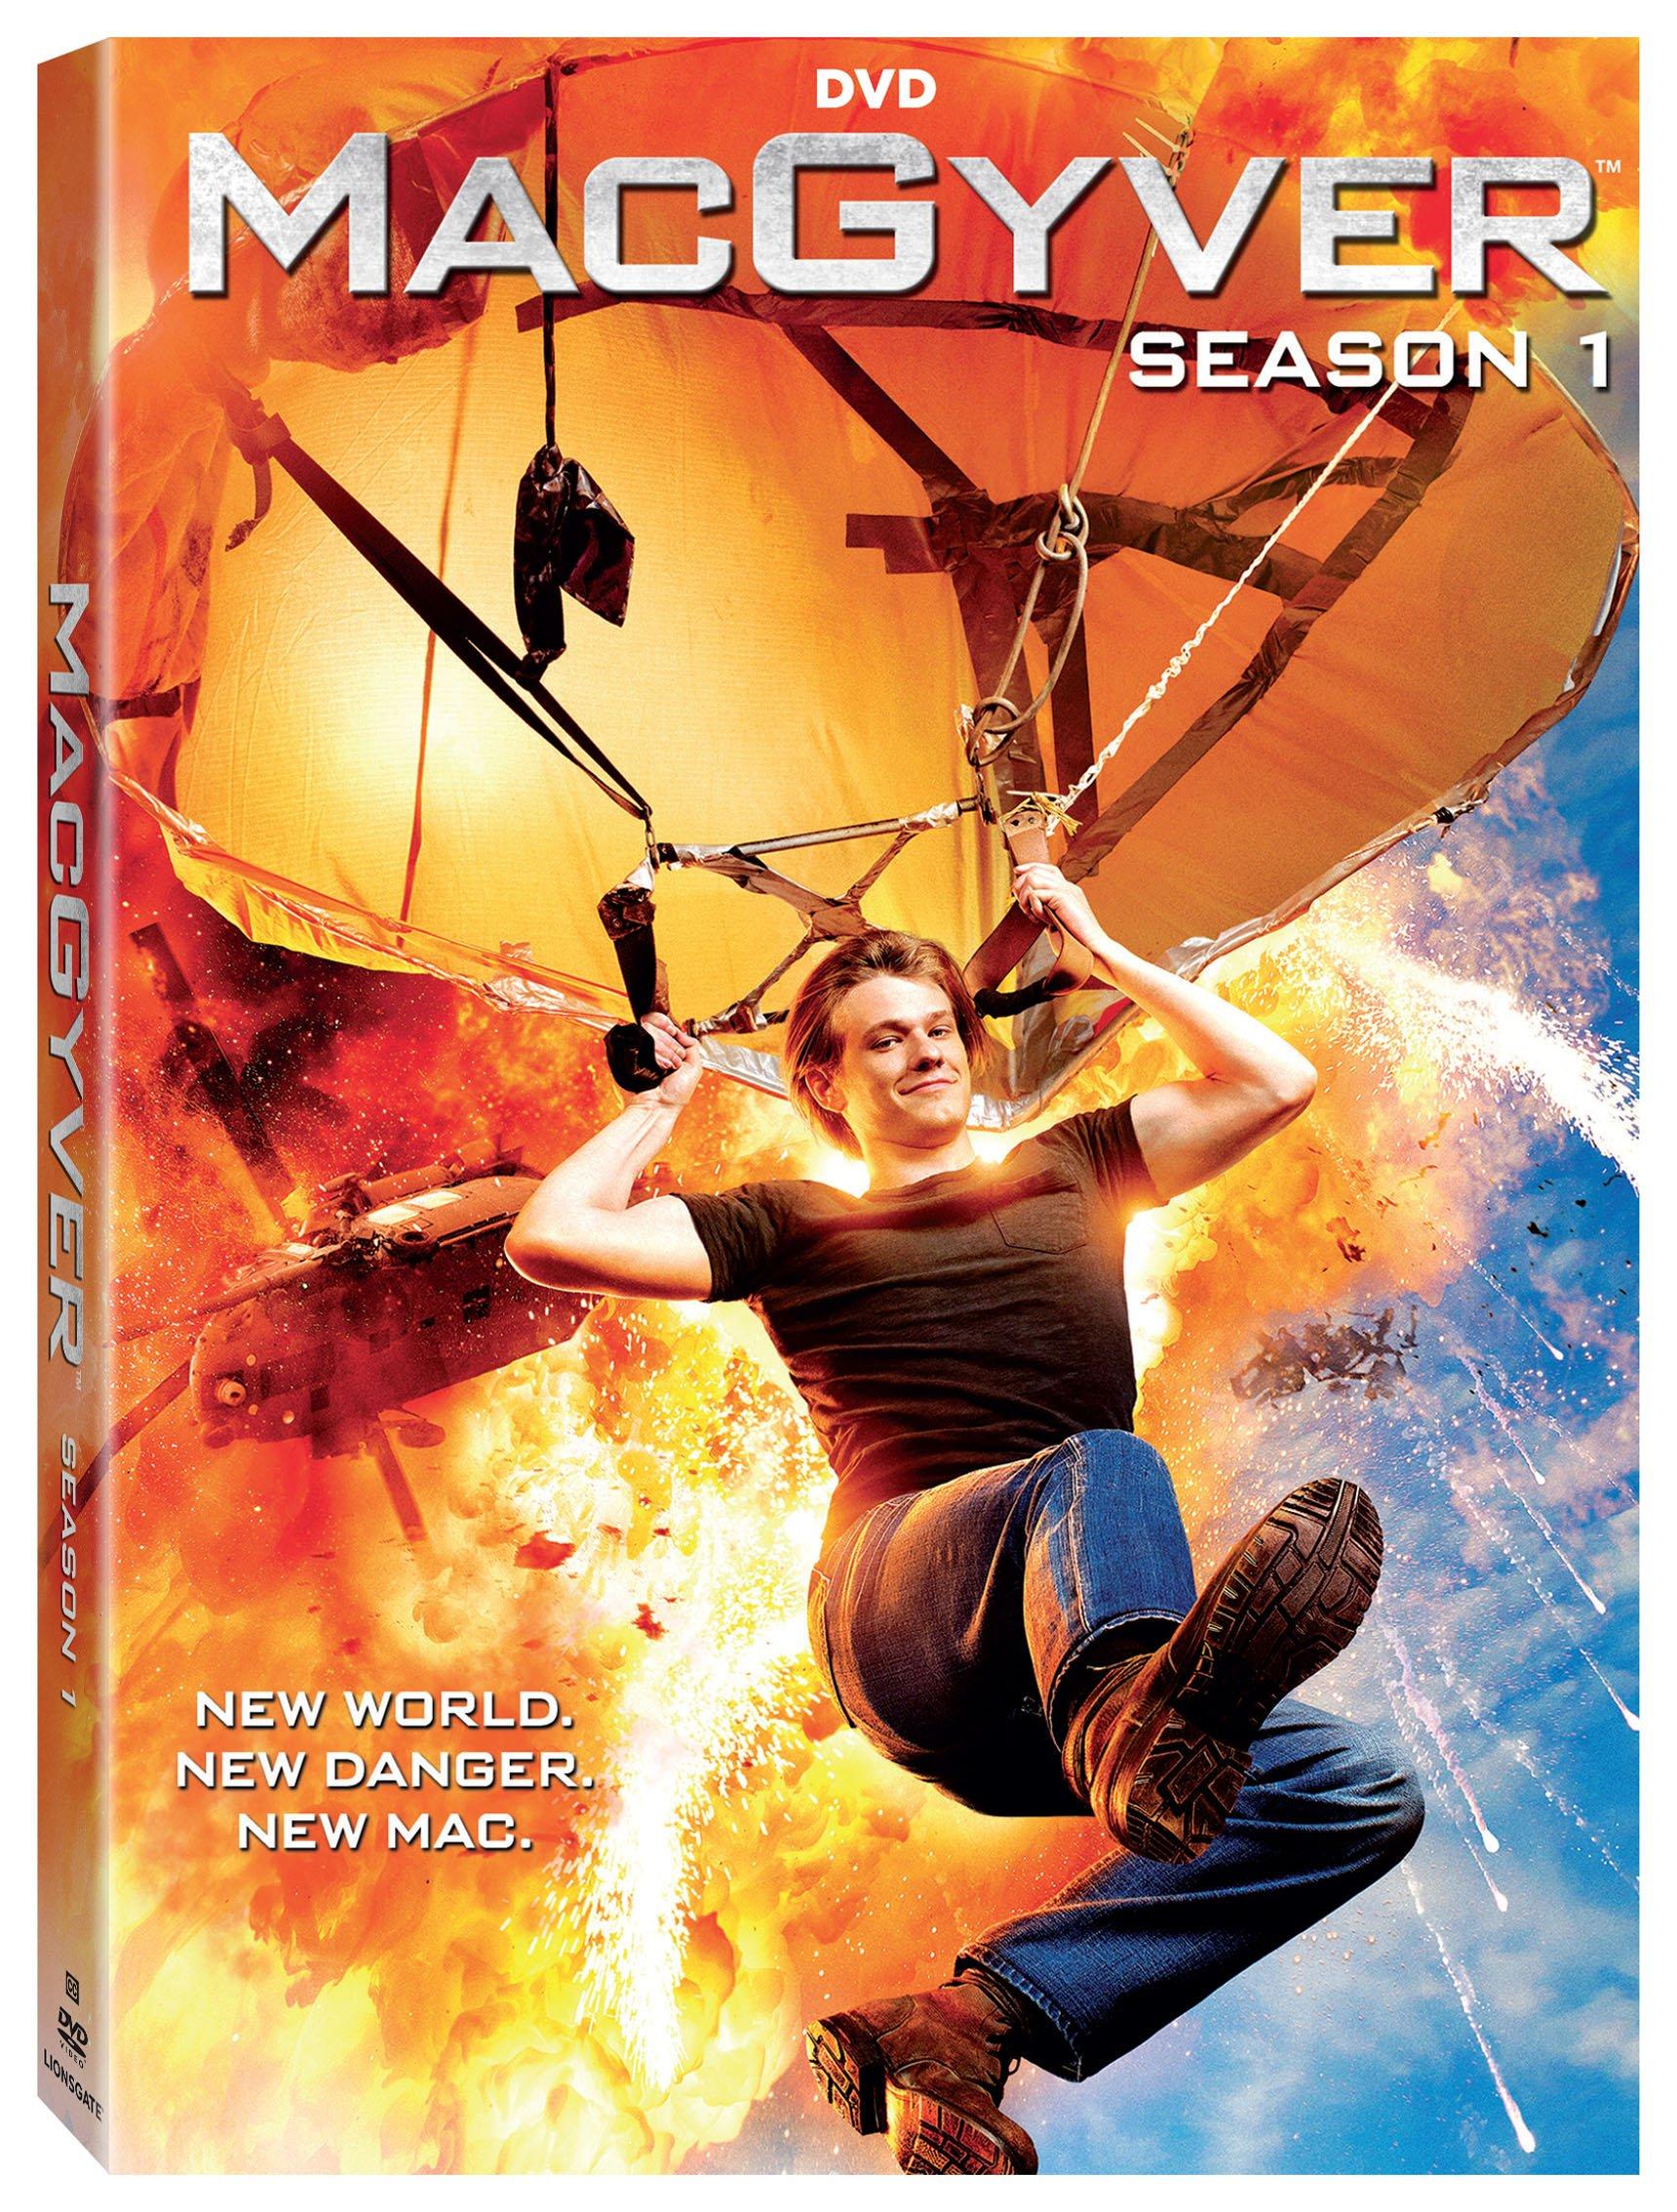 DVD : Macgyver: Season 1 (Boxed Set, Dolby, Widescreen, 5PC)